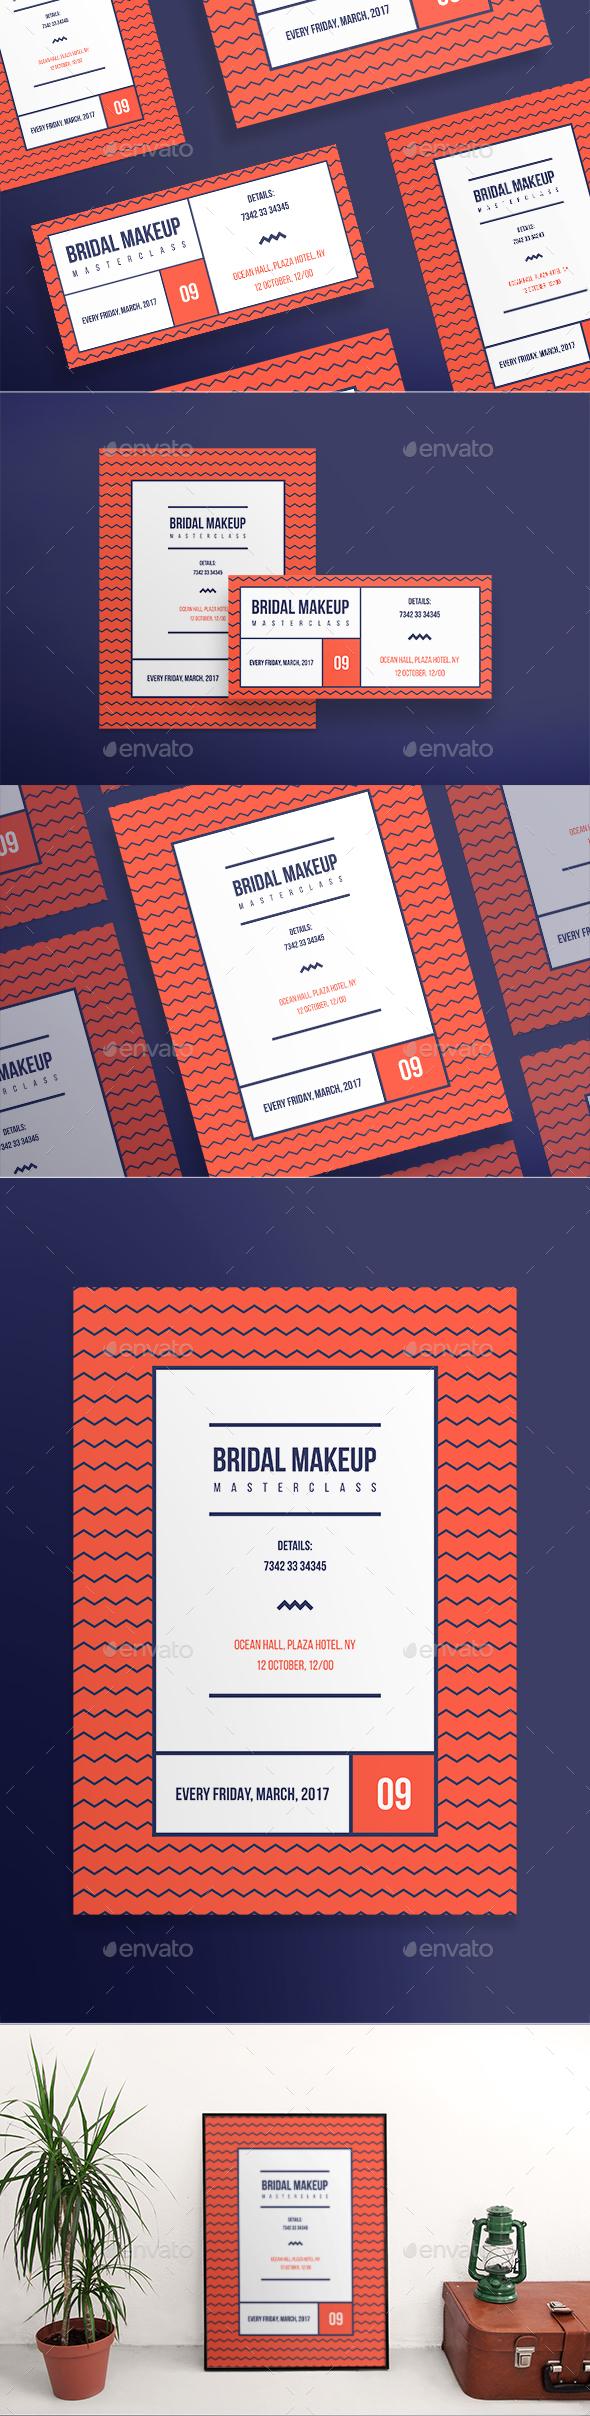 Bridal Makeup Flyers - Miscellaneous Events